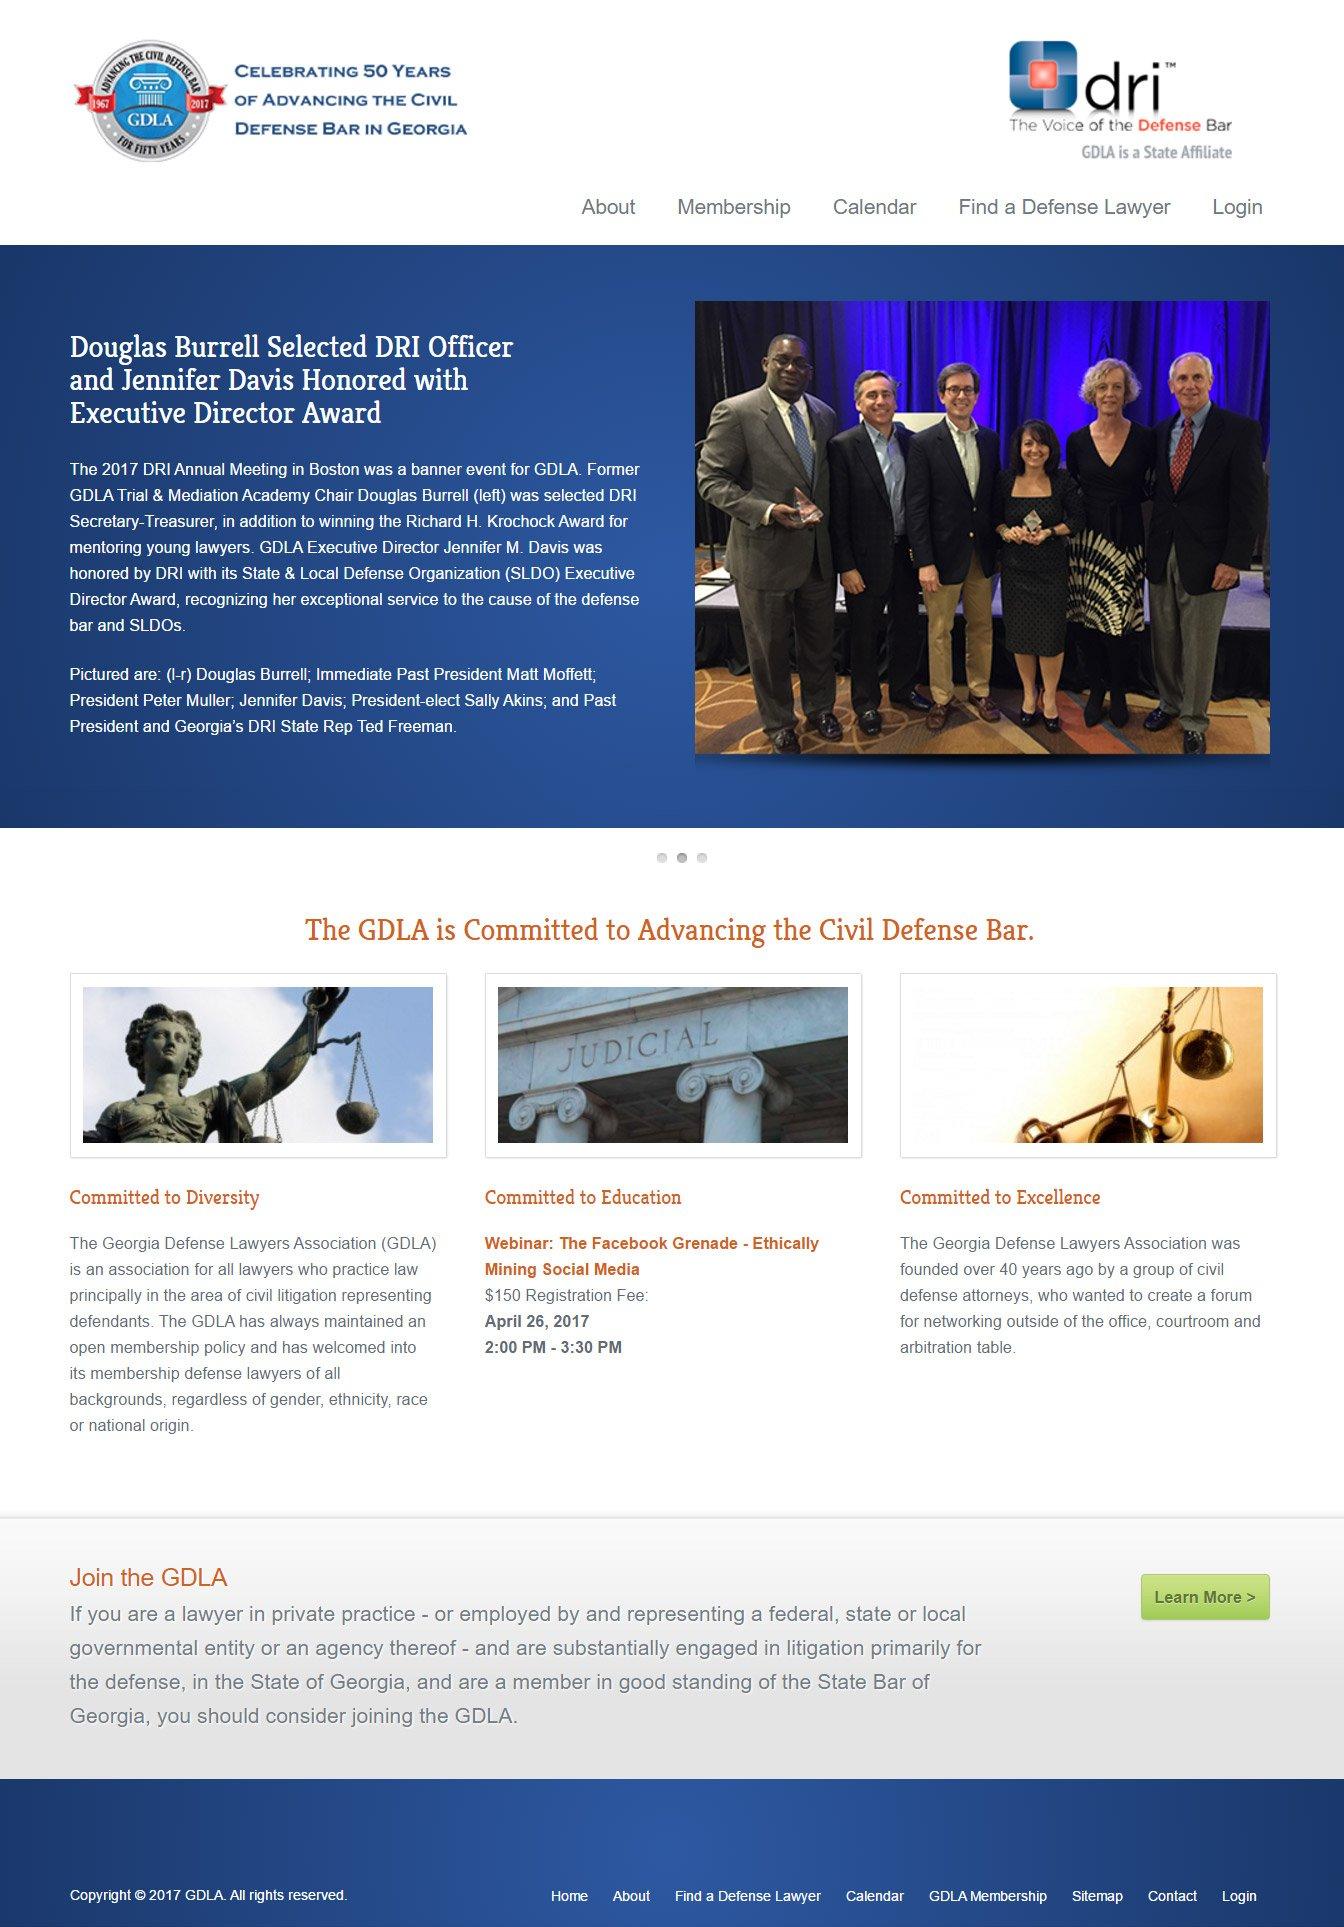 custom content management website development